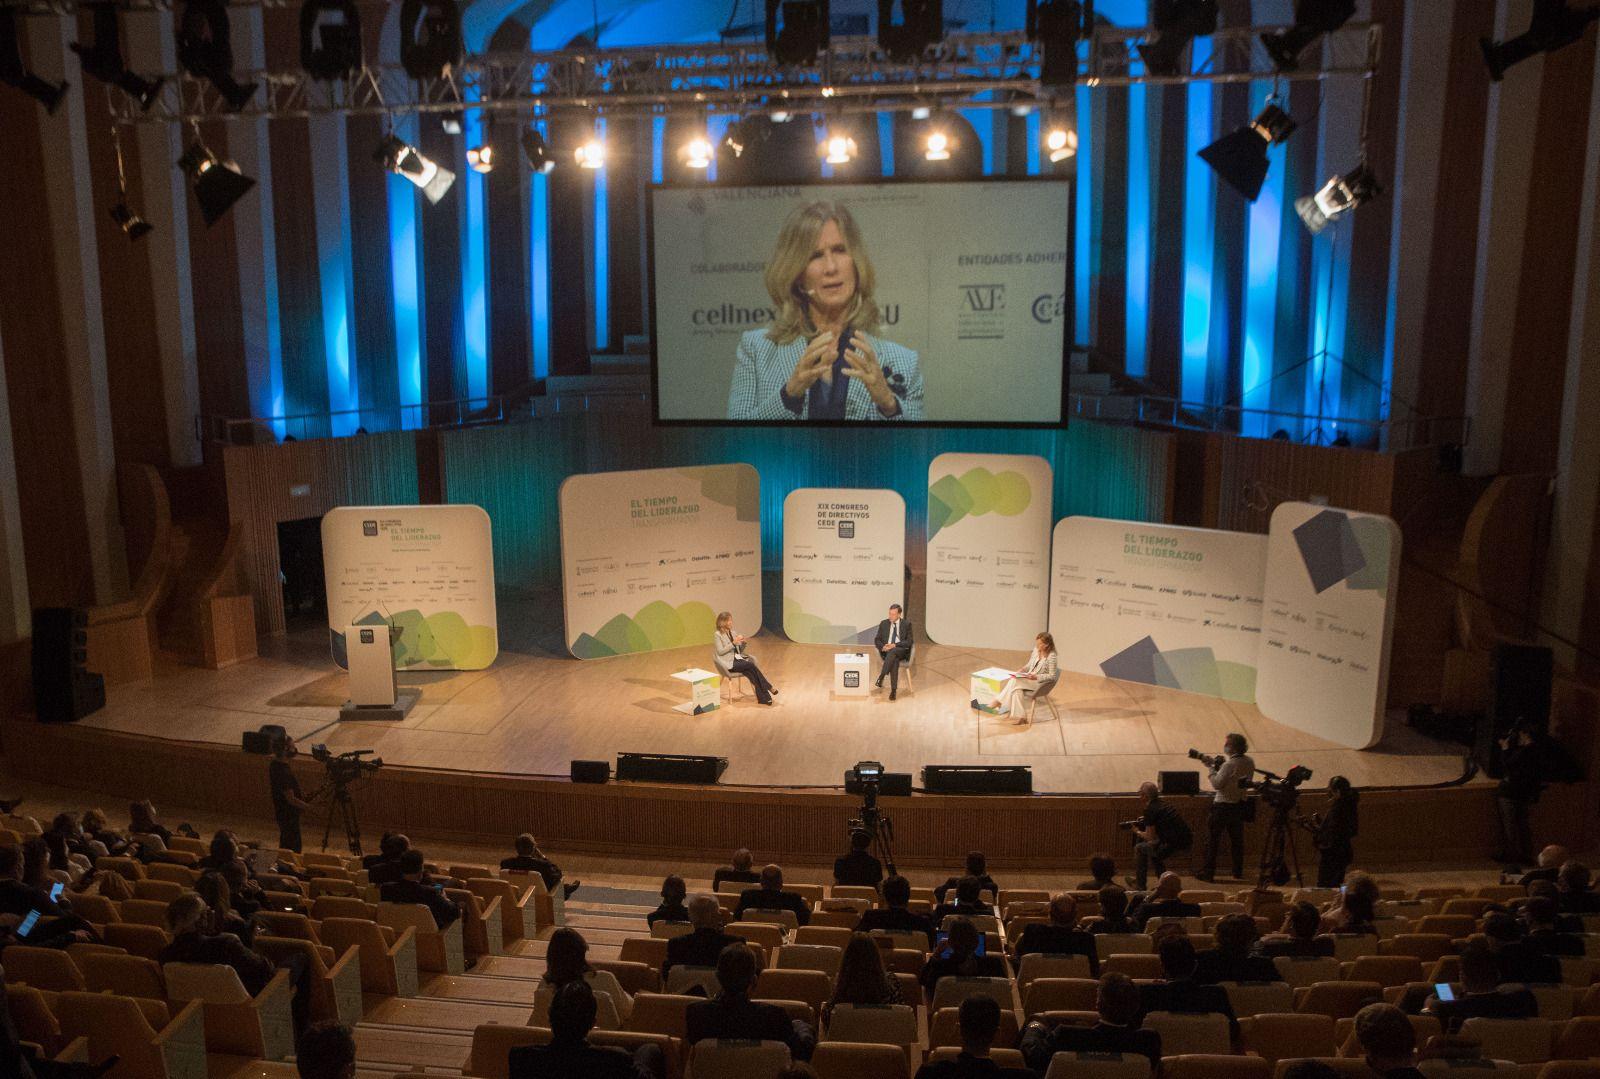 XIX Congreso de directivos CEDE en València